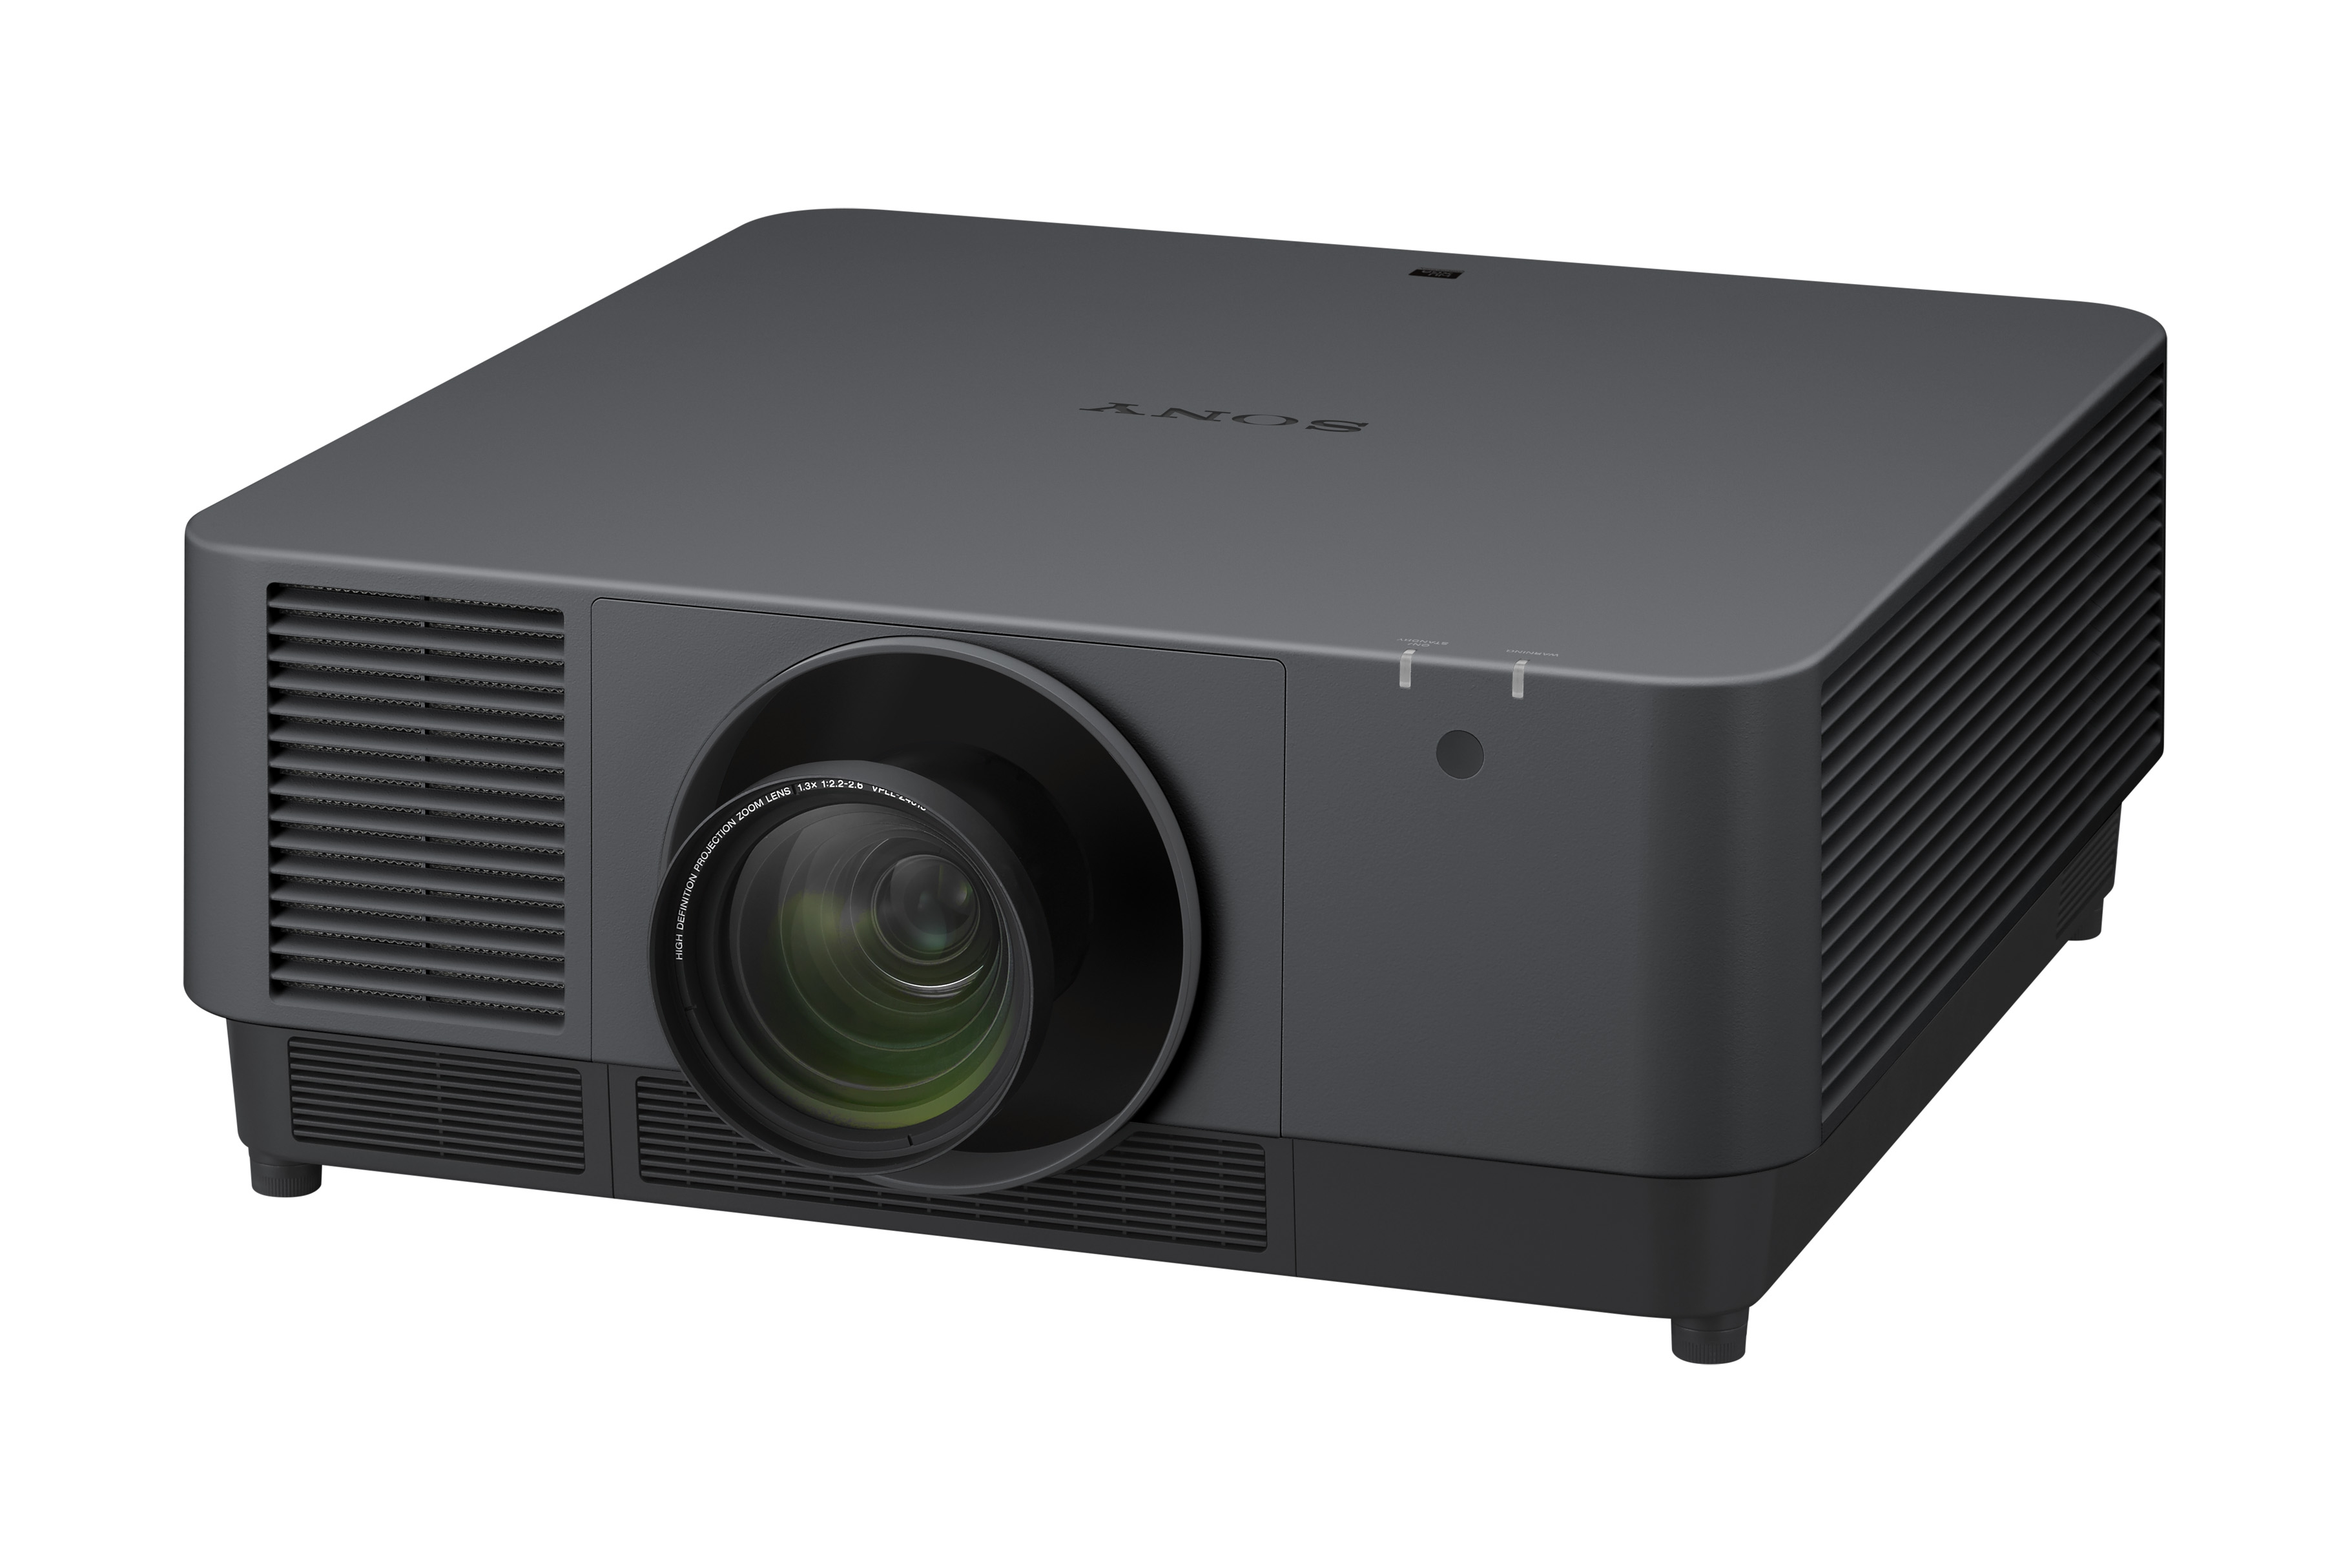 Sony VPL-FHZ90L/B 9000lm WUXGA Laser Projector (Black)